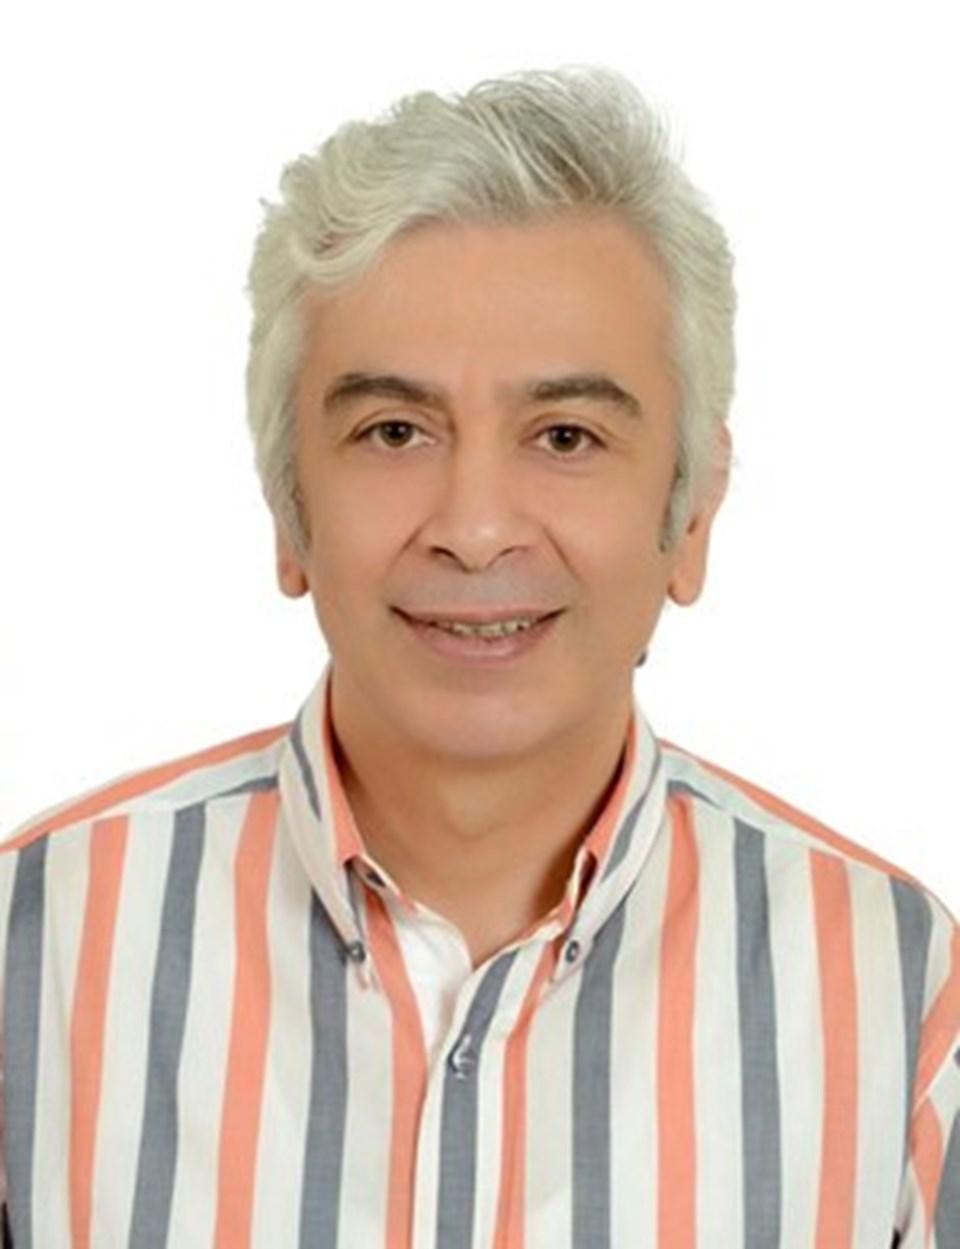 Uzm. Dr. Atilla Bektaş